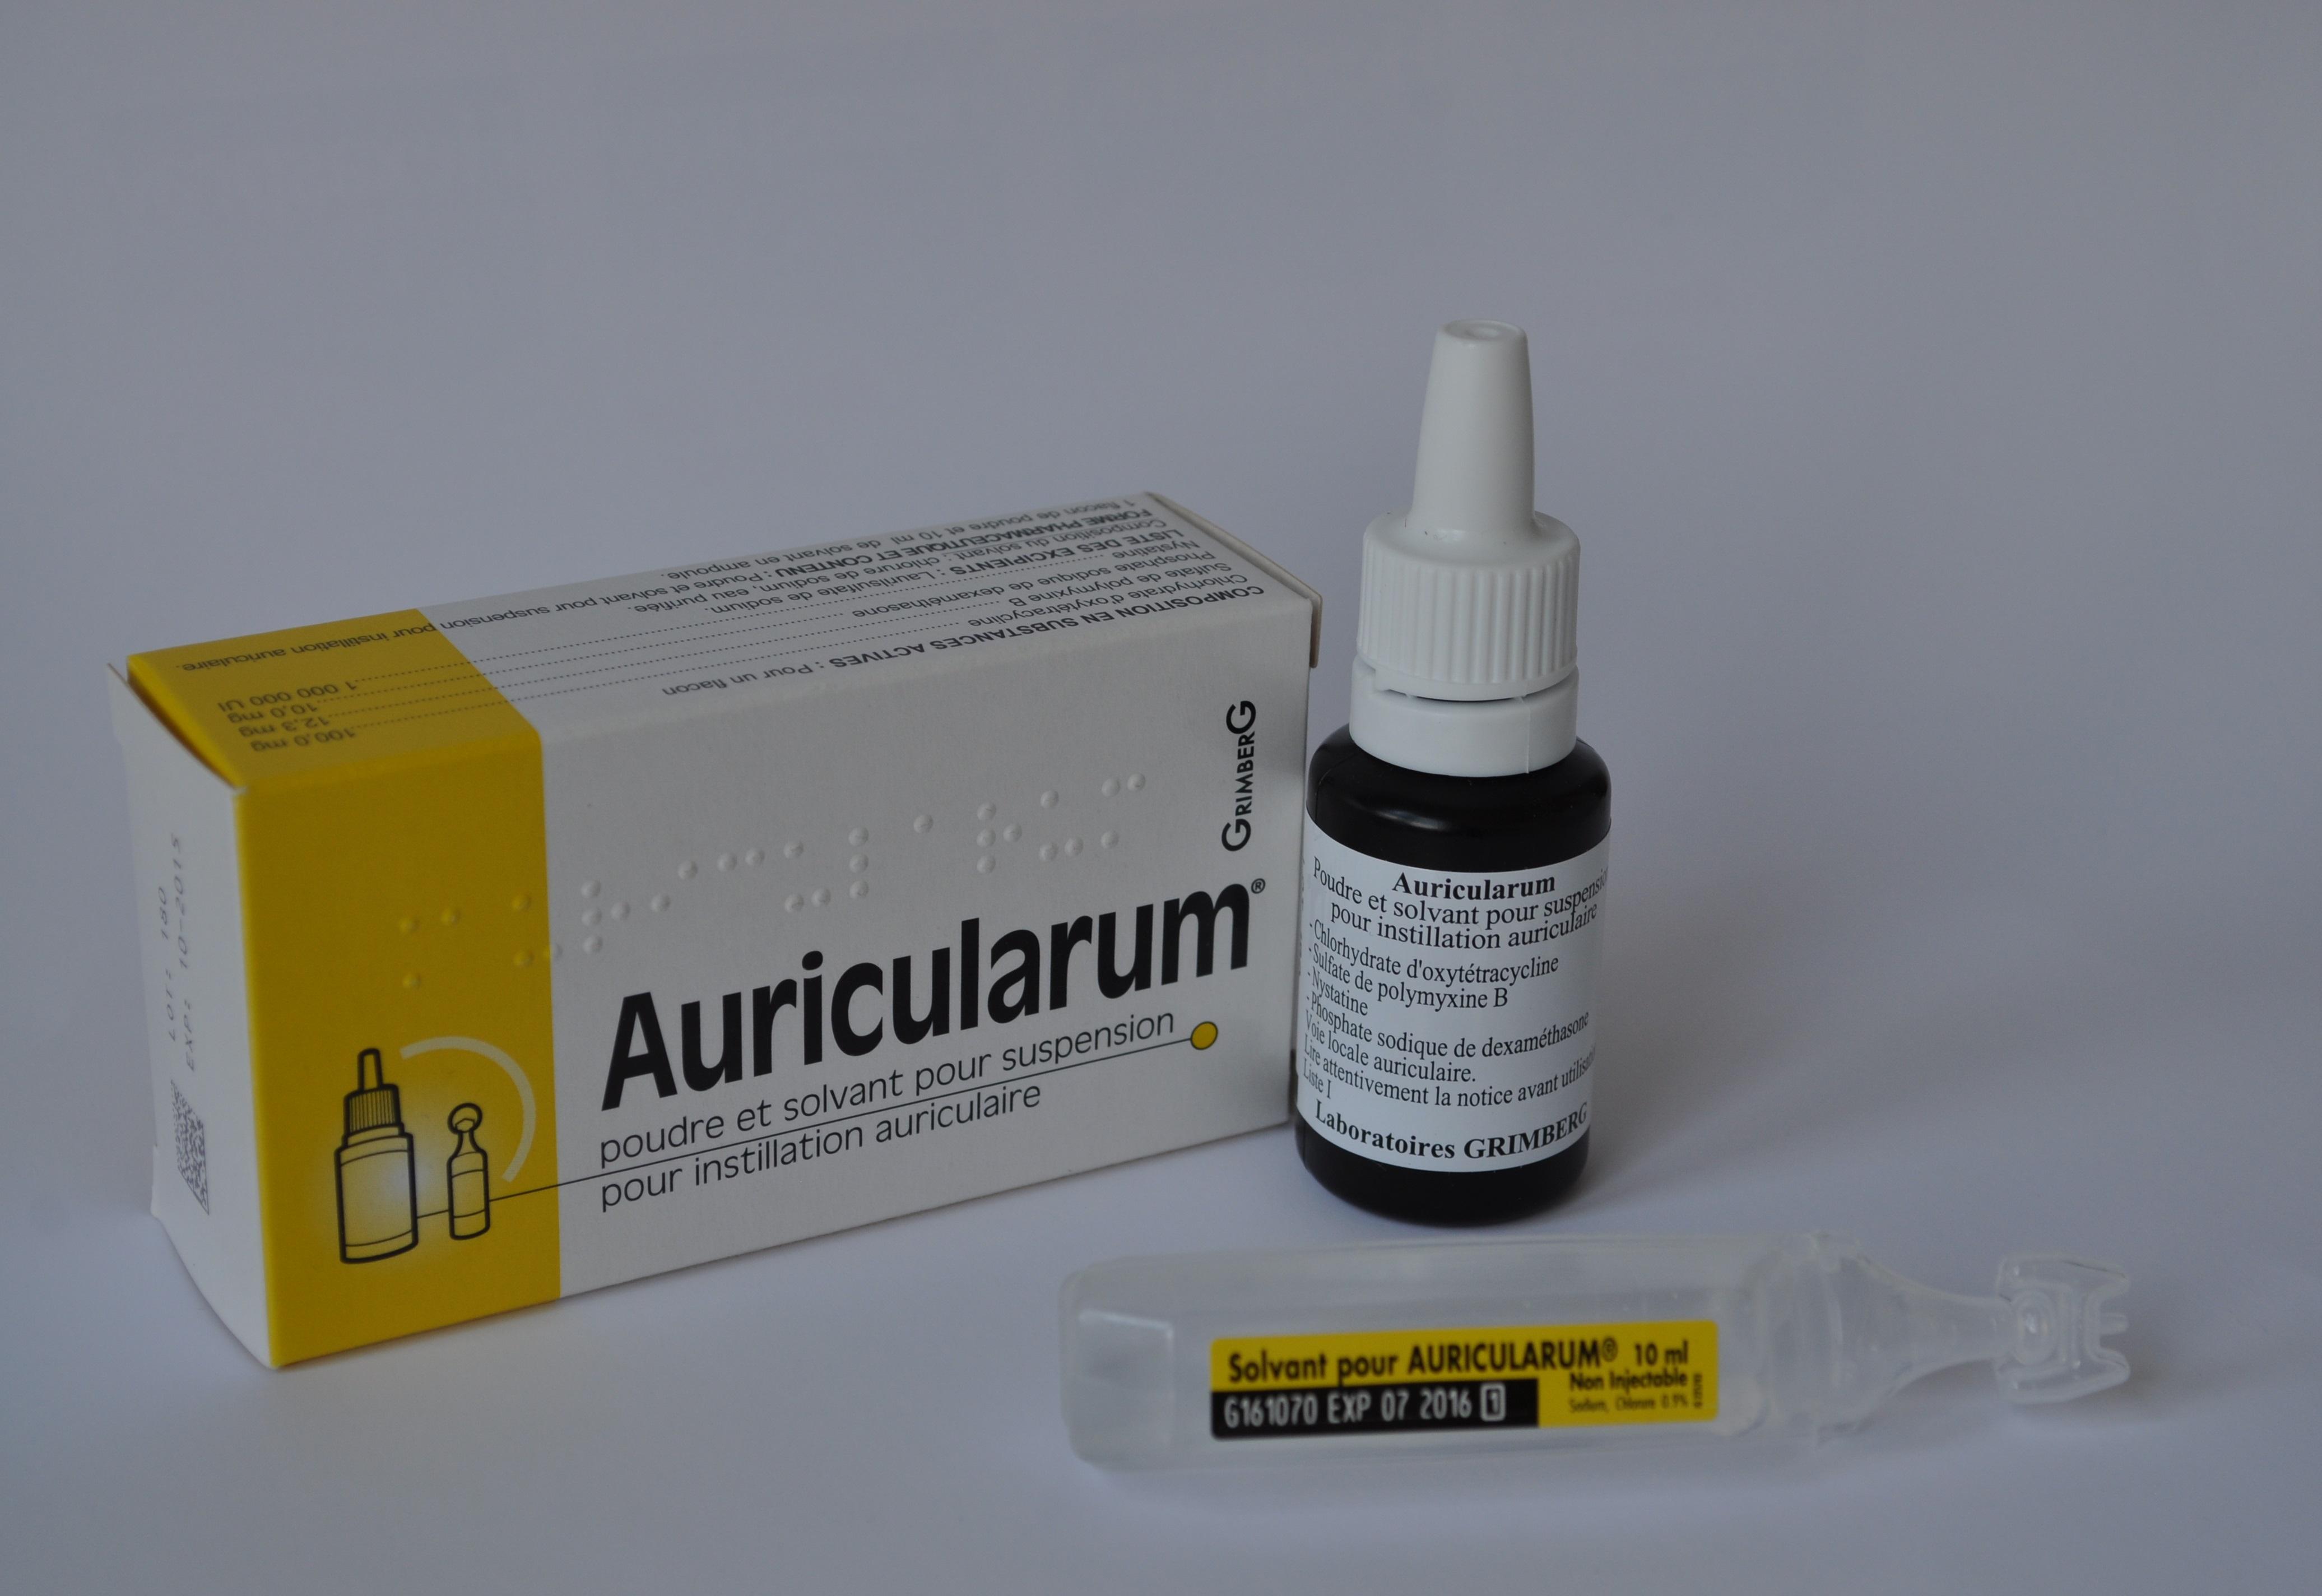 Image AURICULARUM Pdr & sol aur Fl+Amp/10ml